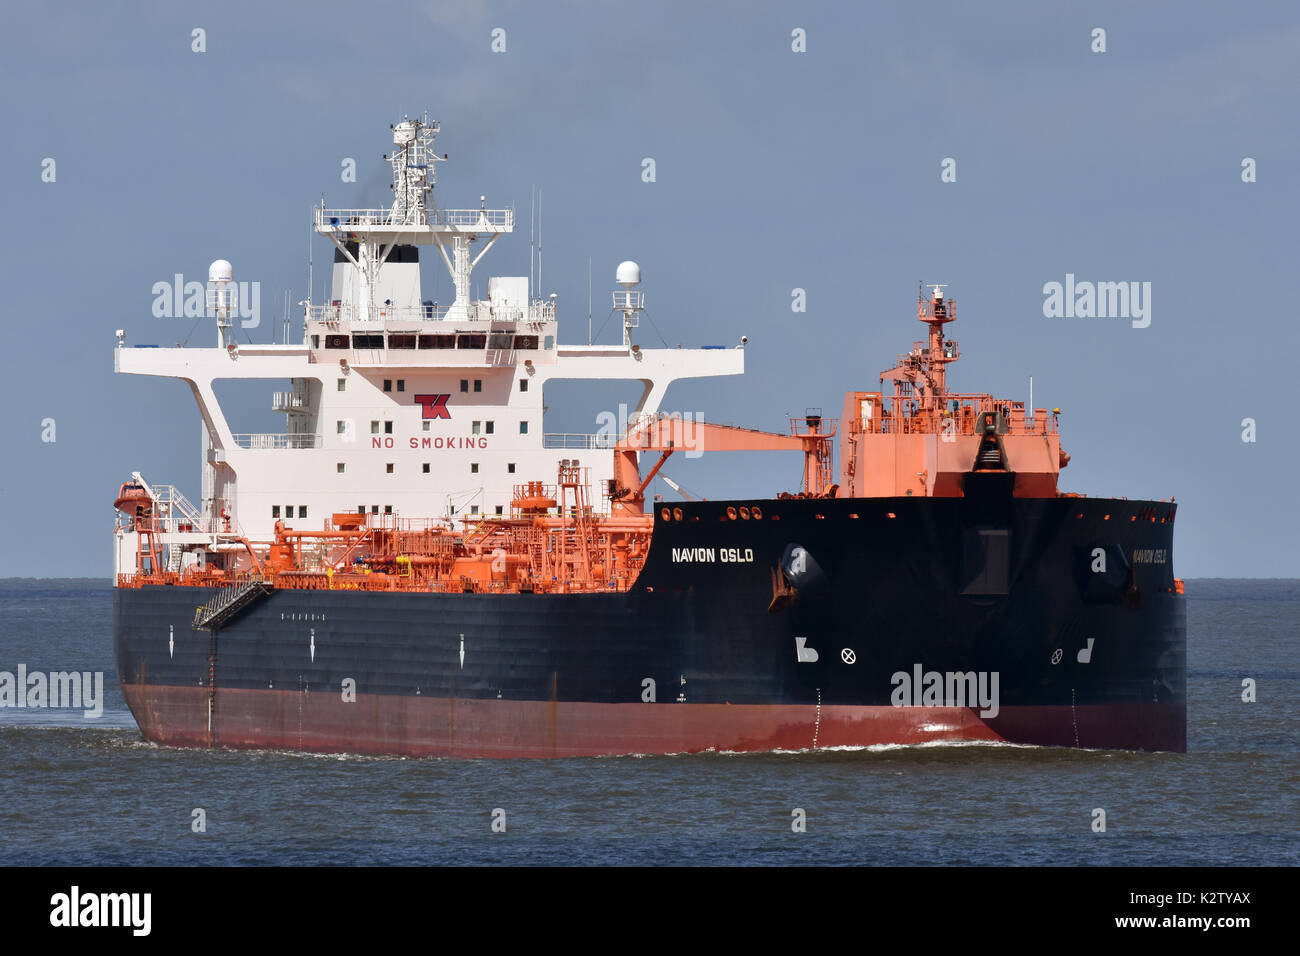 Navion Oslo - Stock Image